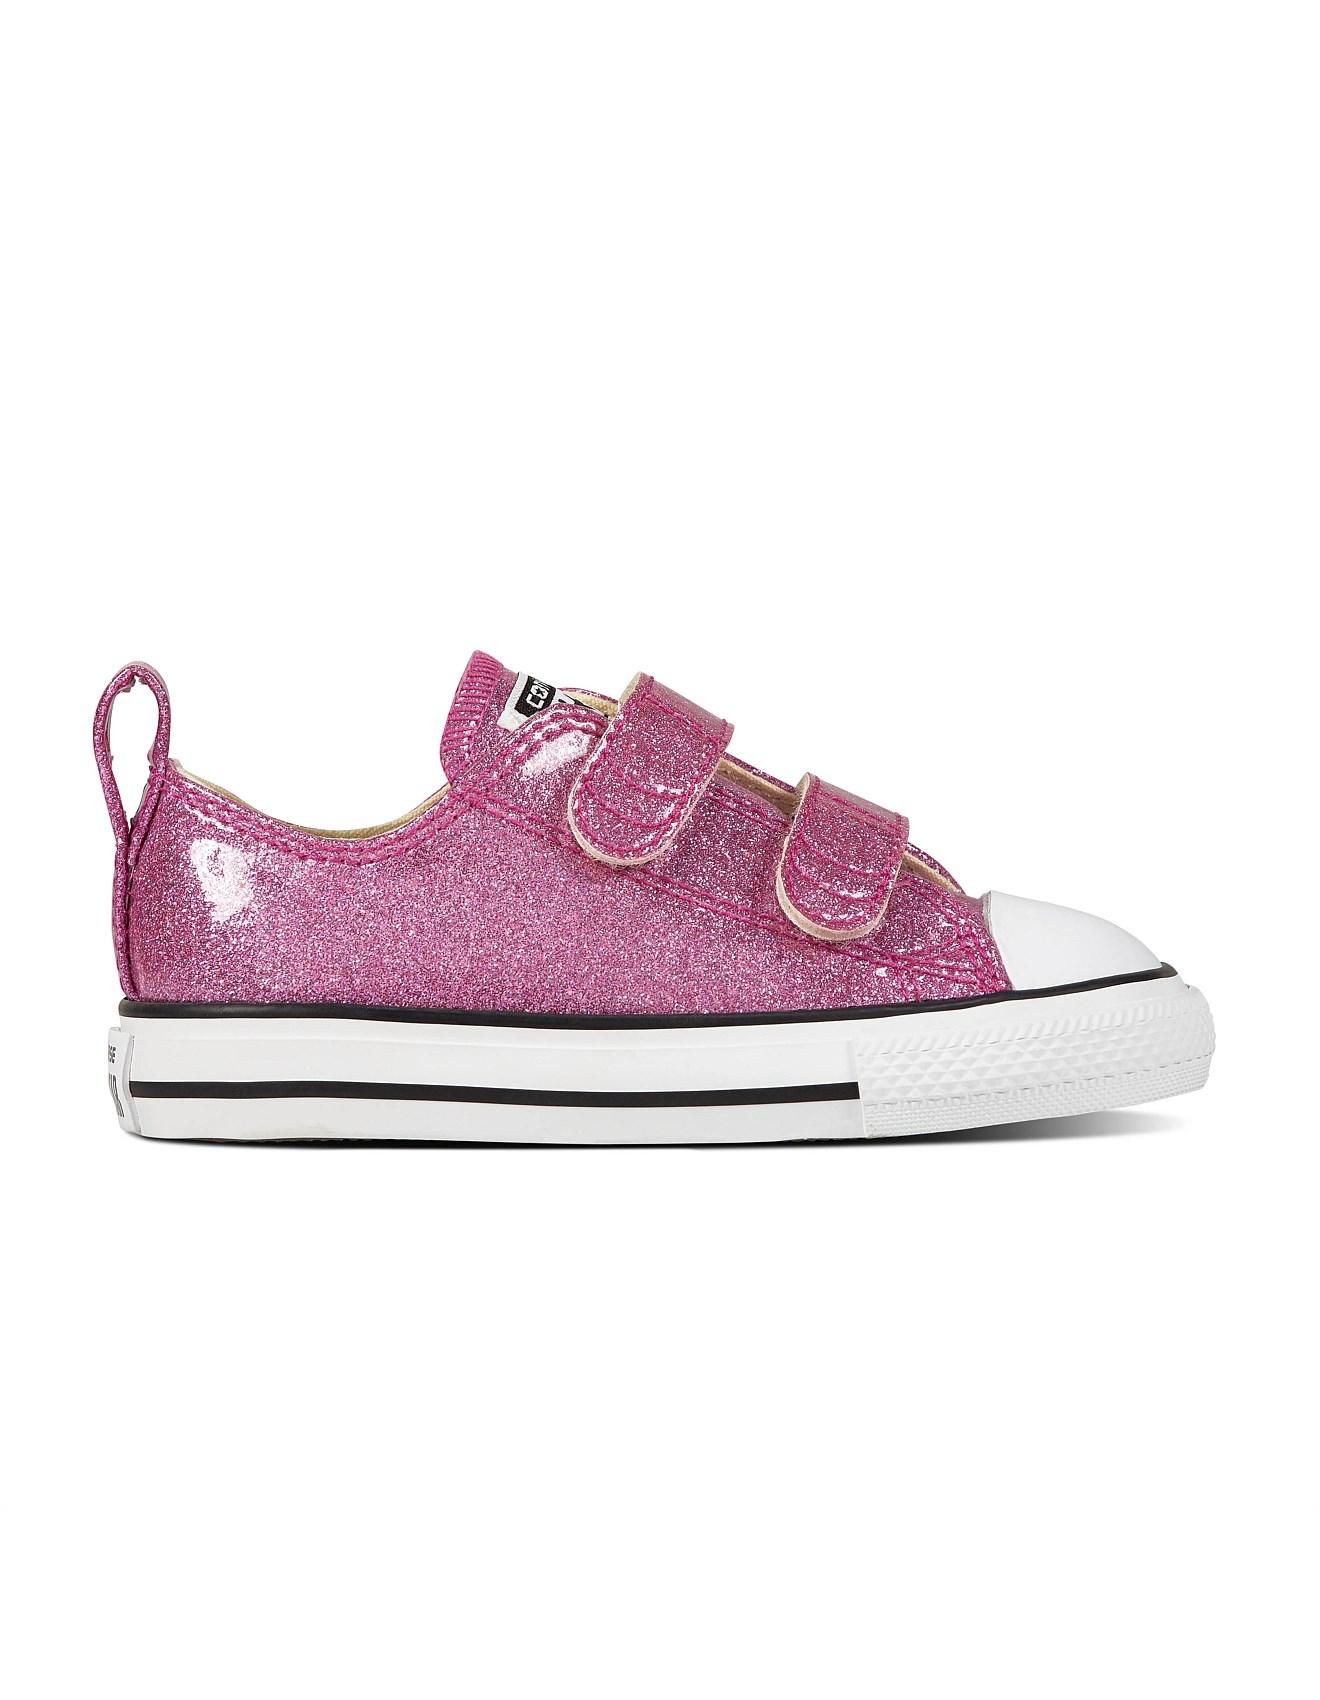 bebf5249fb3 Chuck Taylor All Star Glitter Sneaker